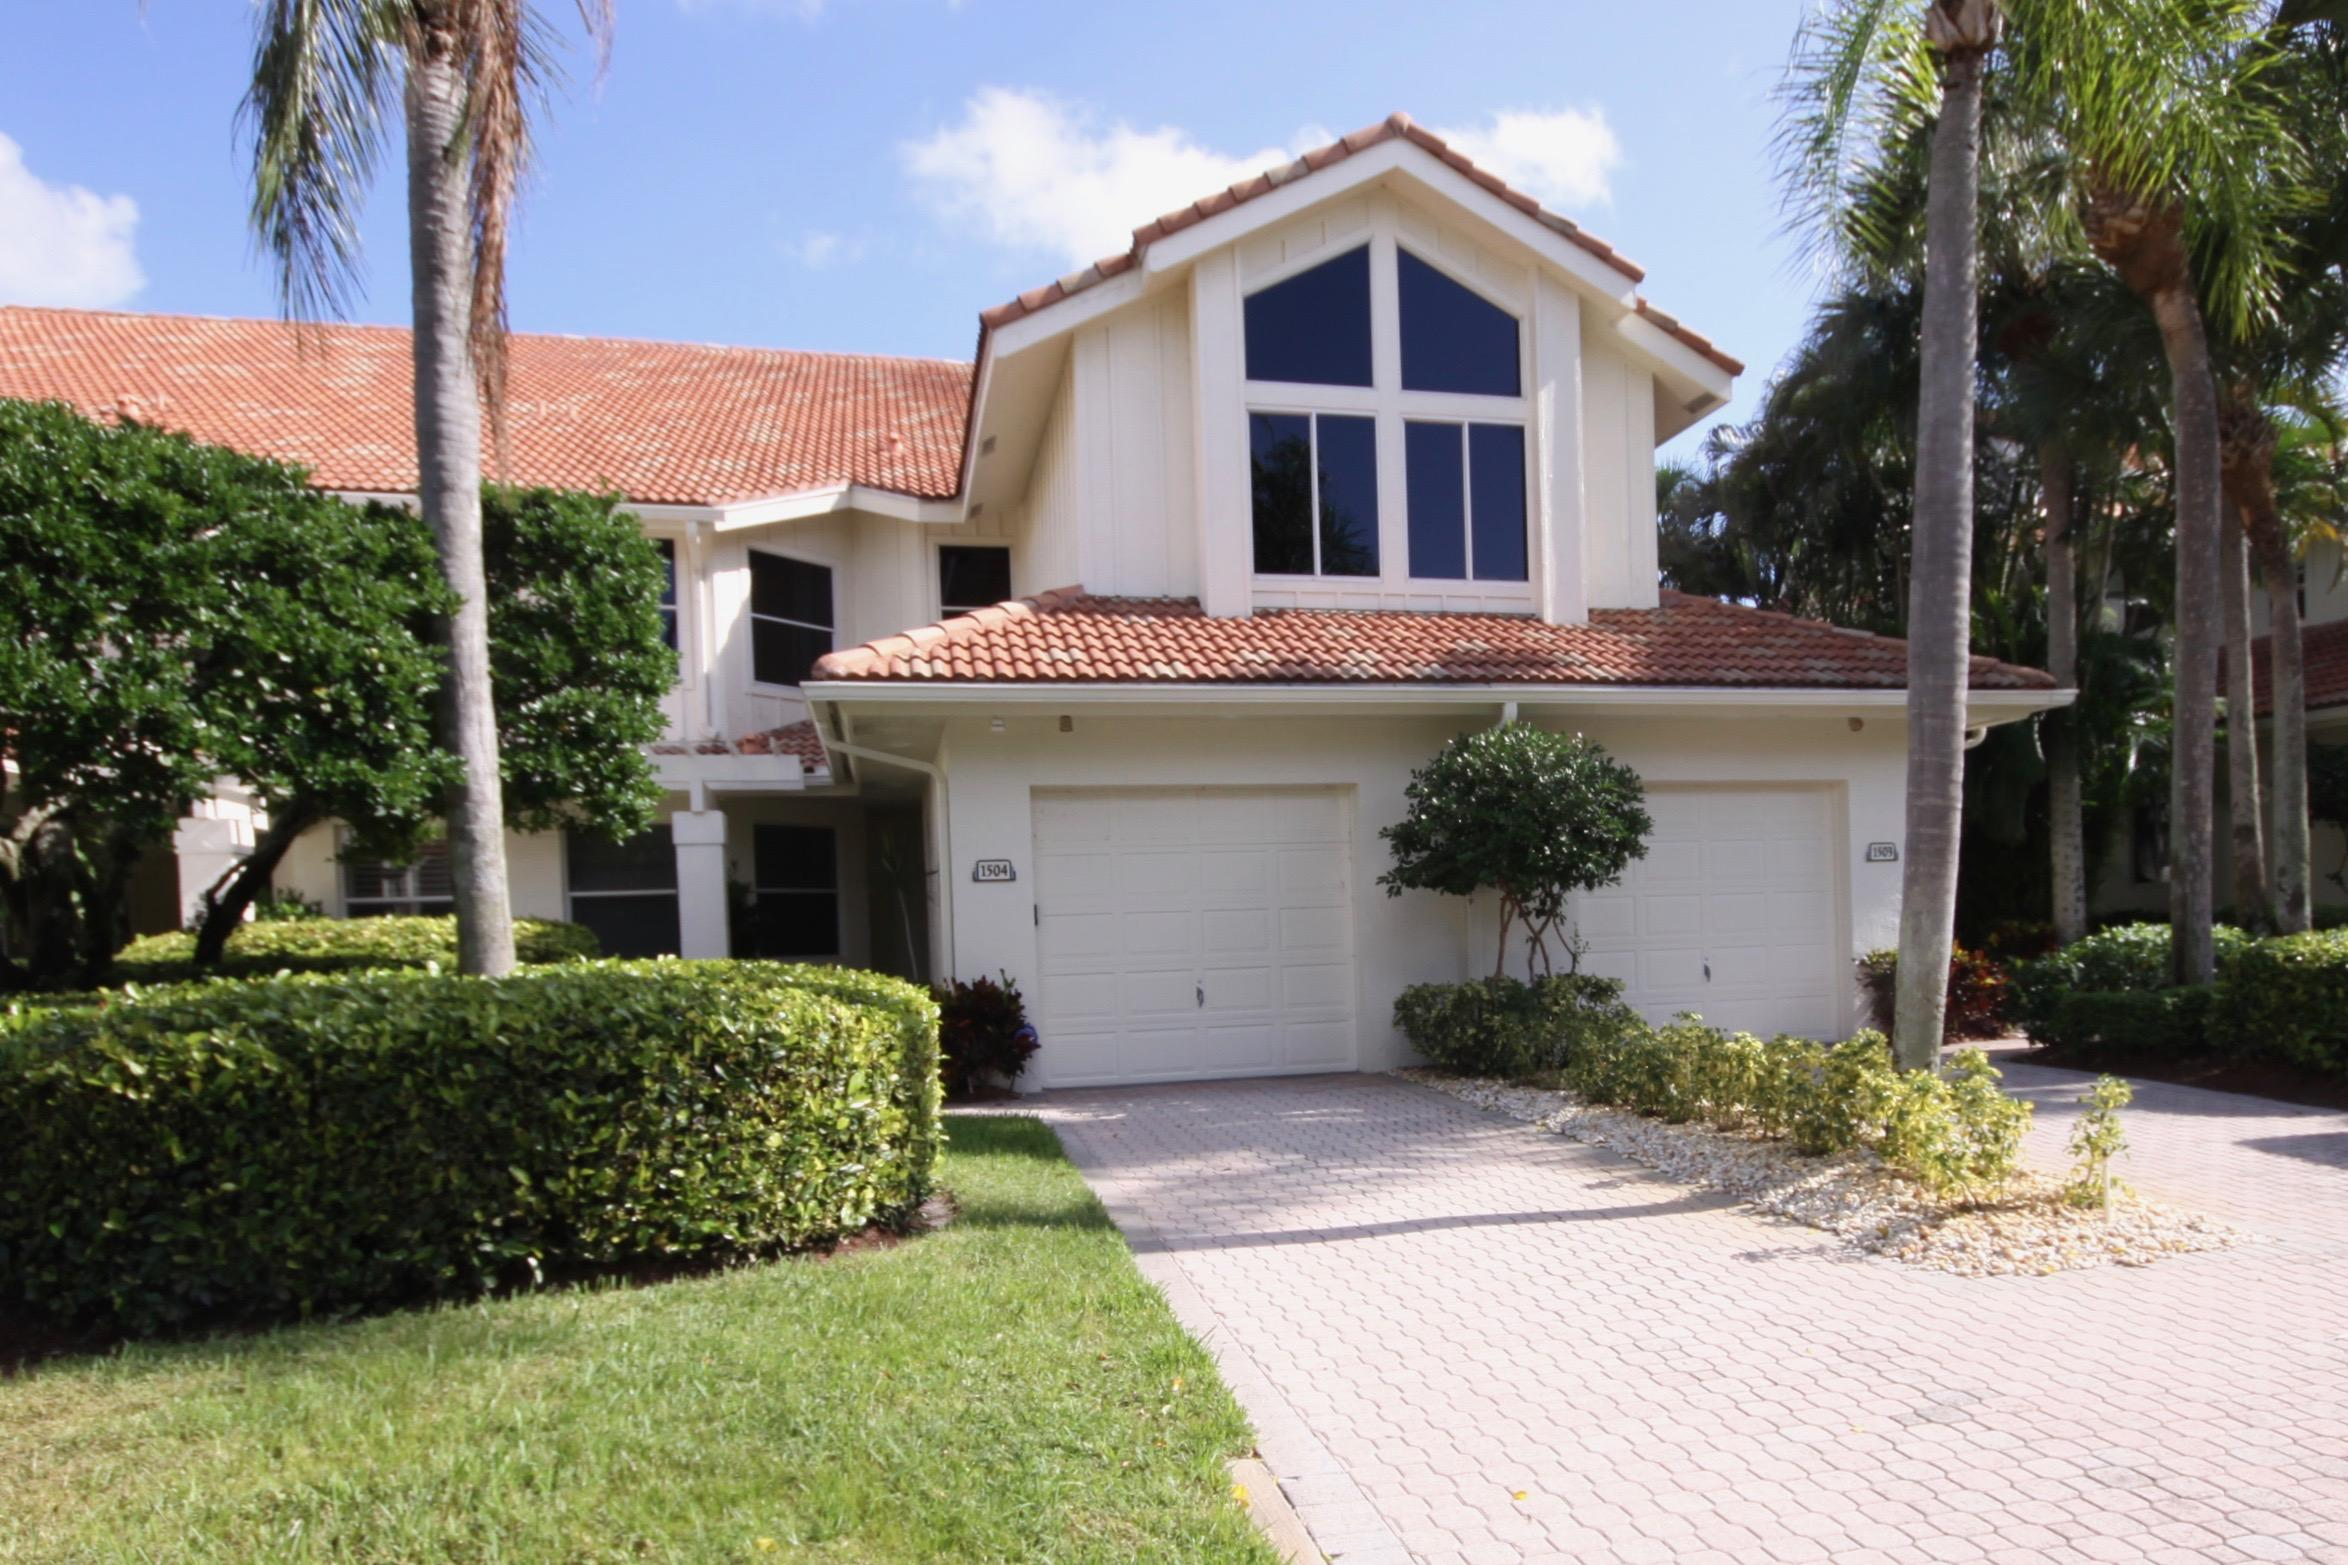 2424 NW 59TH Street #1504 Boca Raton, FL 33496